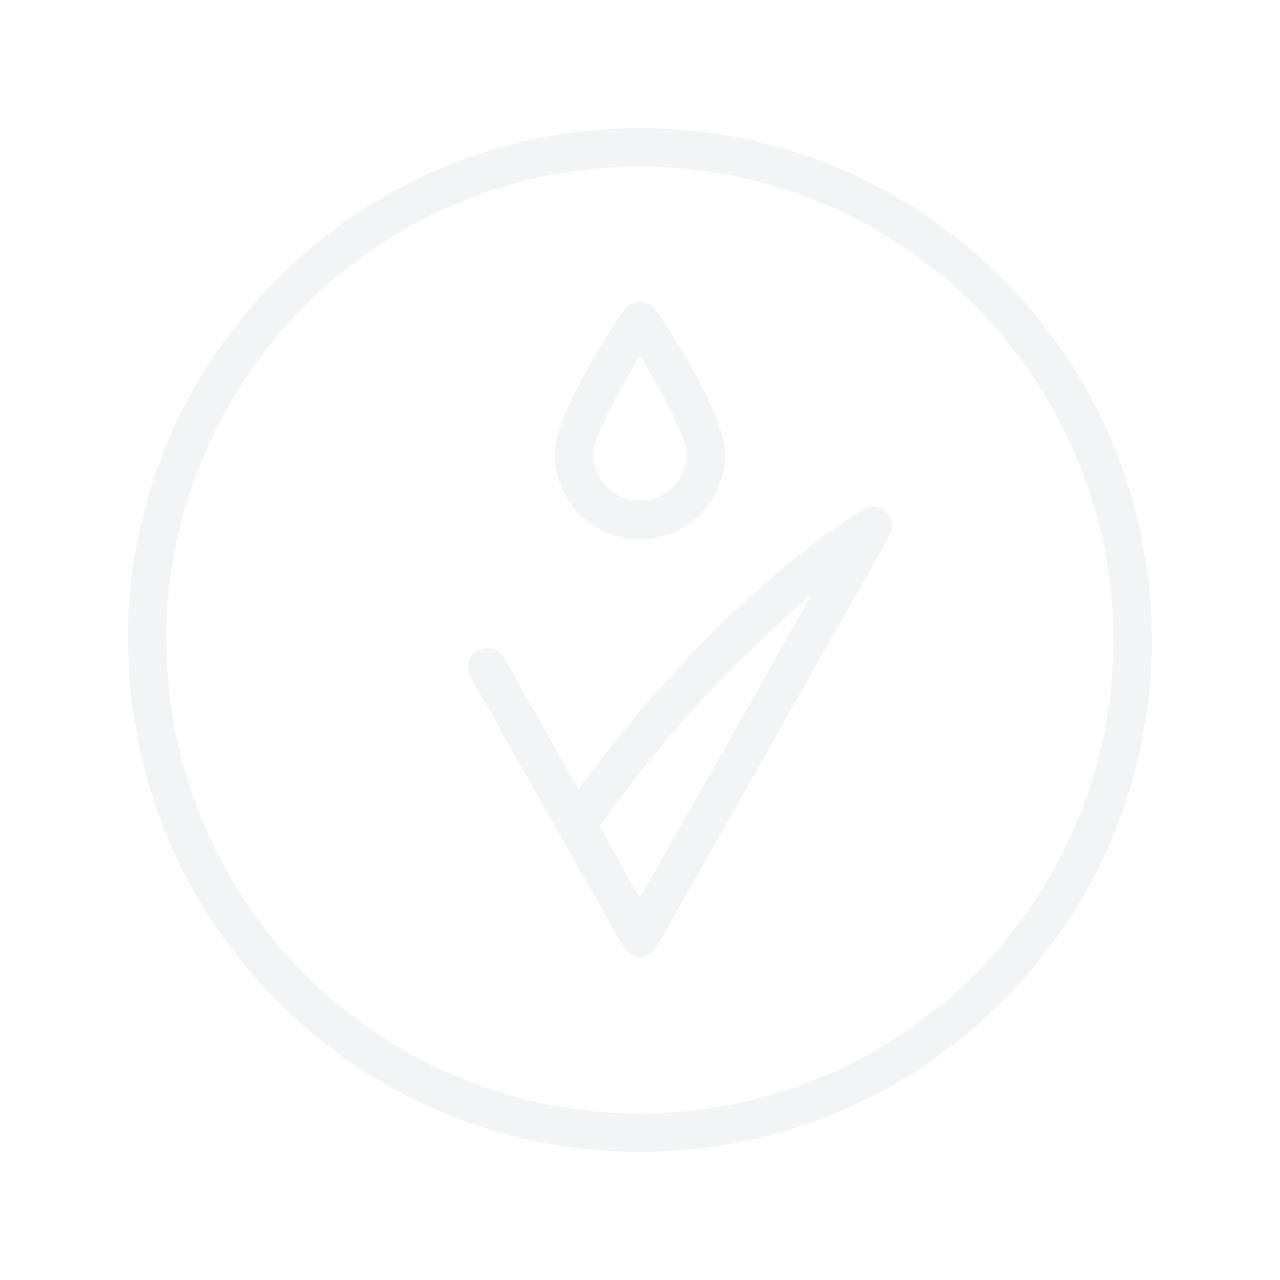 Dolce & Gabbana The One Men Deodorant Stick 70g